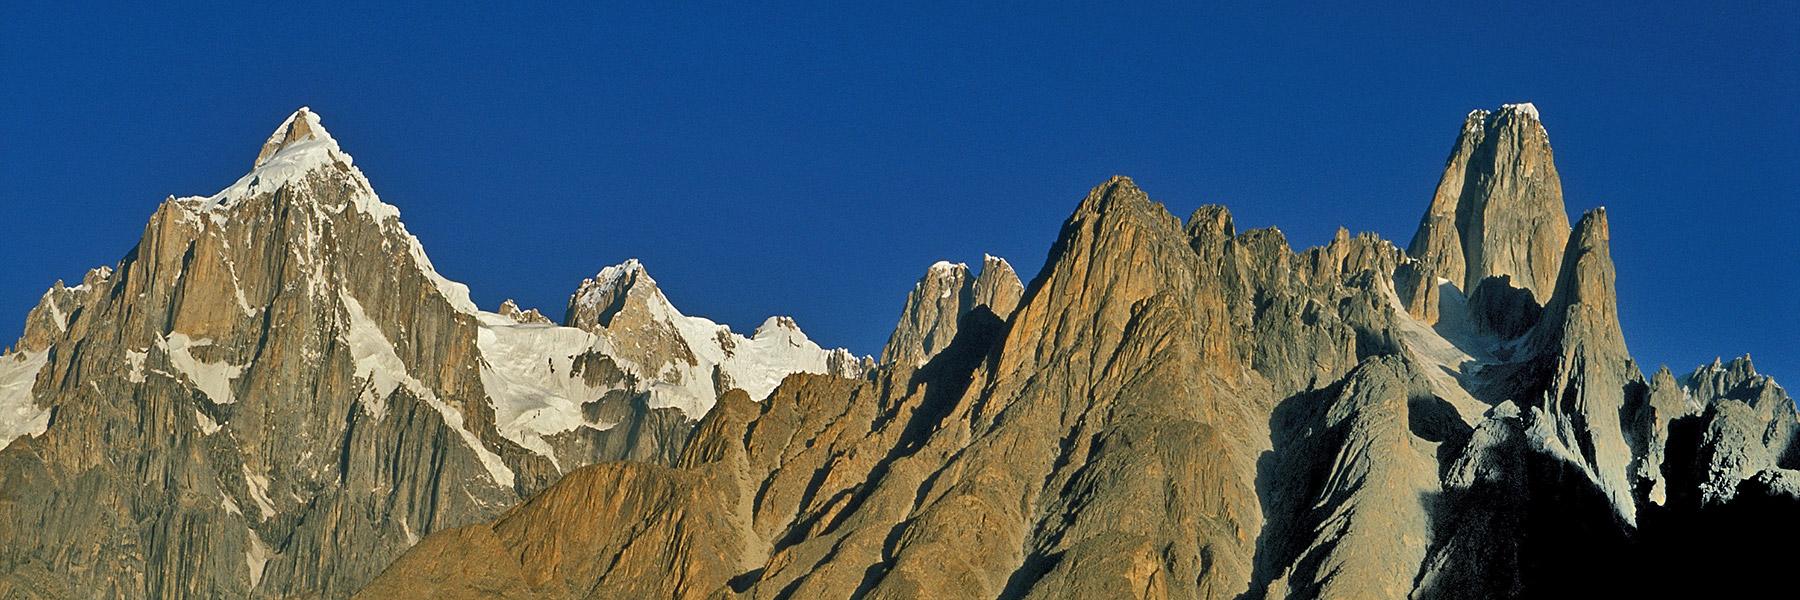 Baltistan_033A-18x6